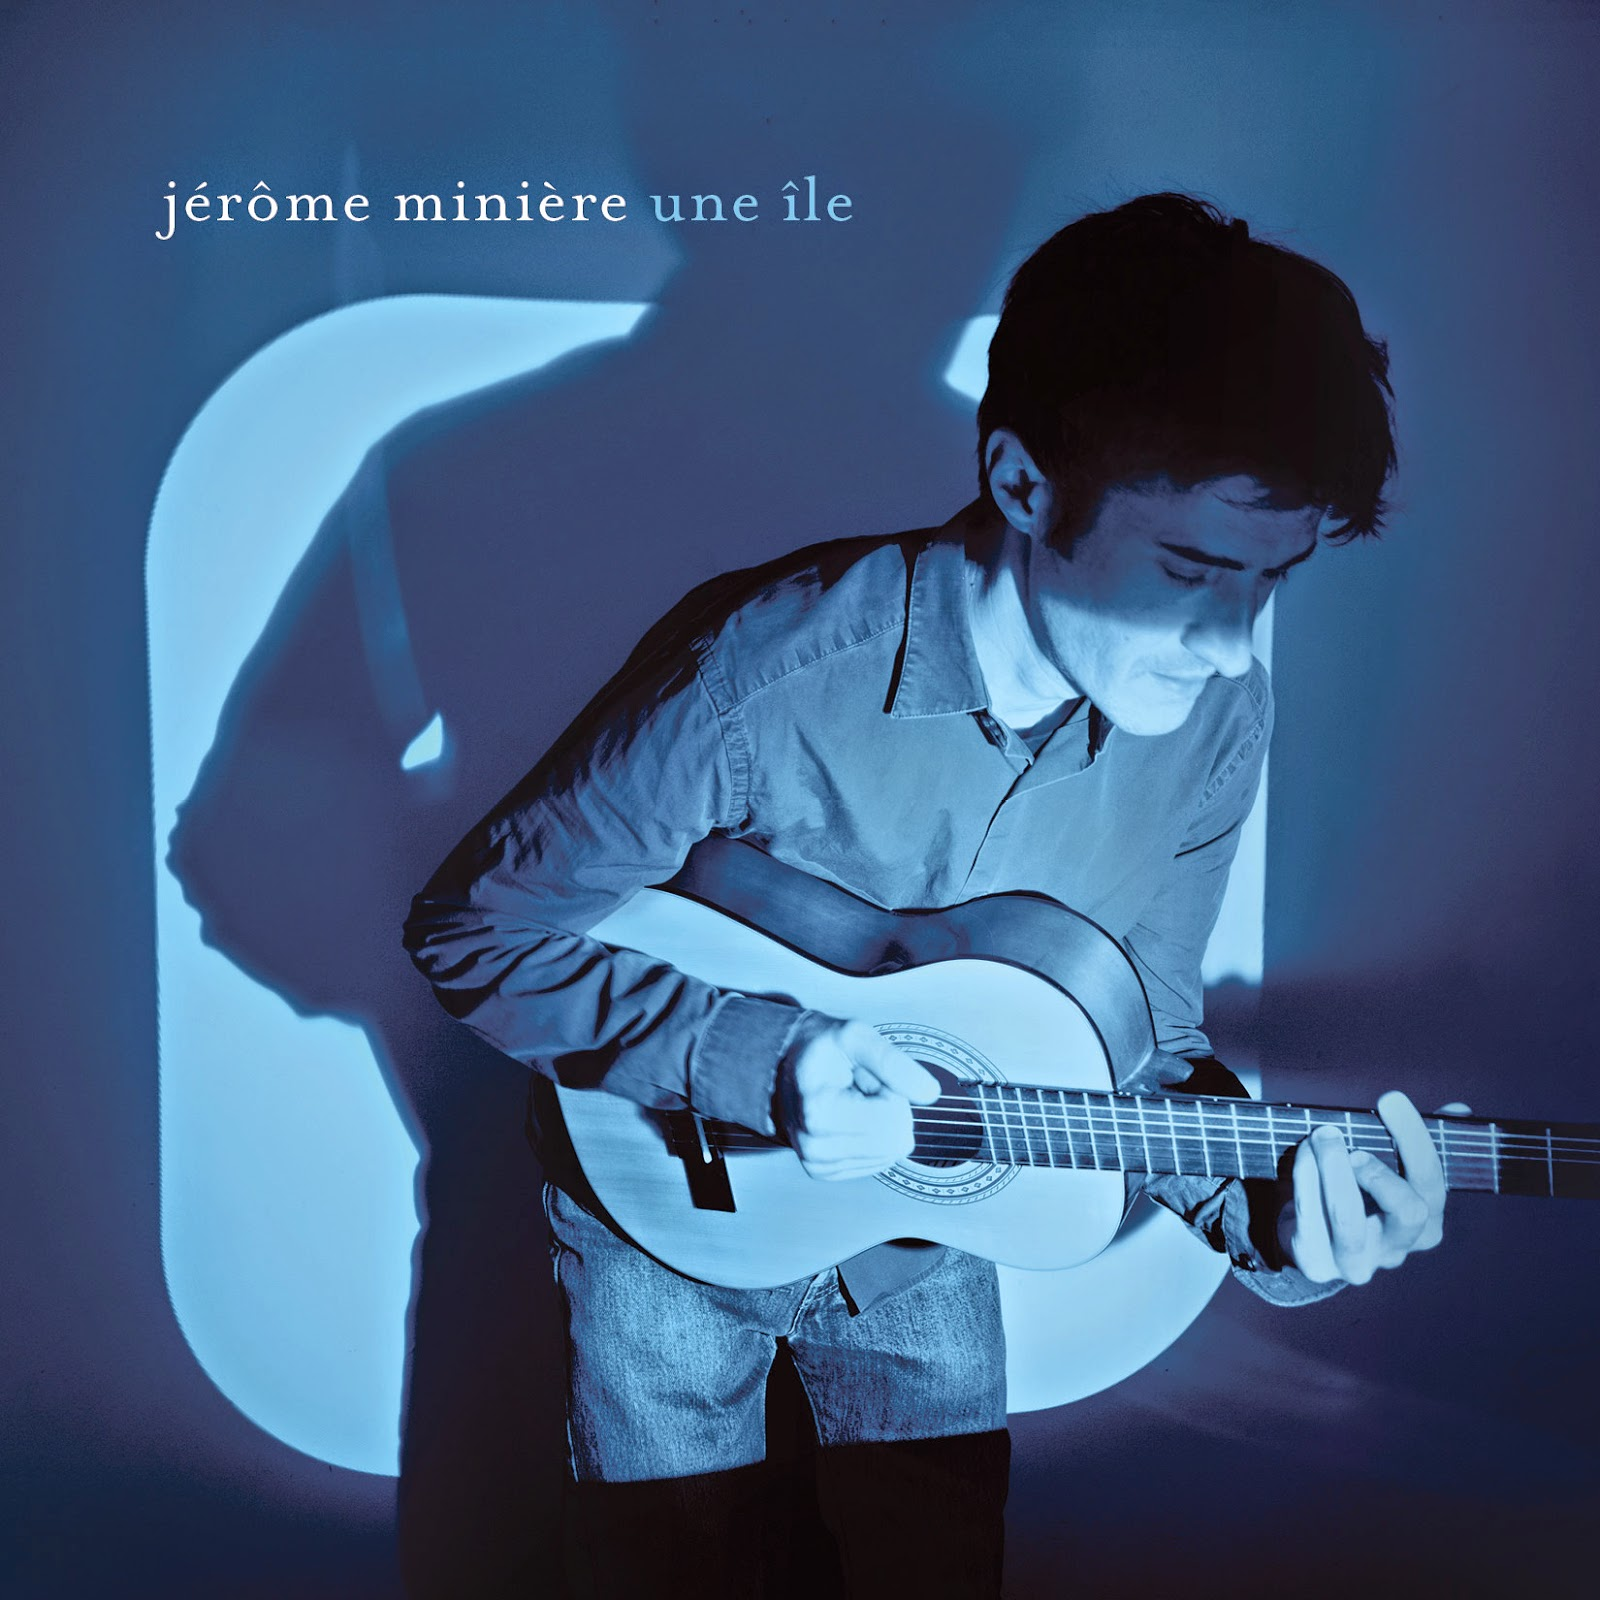 http://jeromeminiere.tumblr.com/